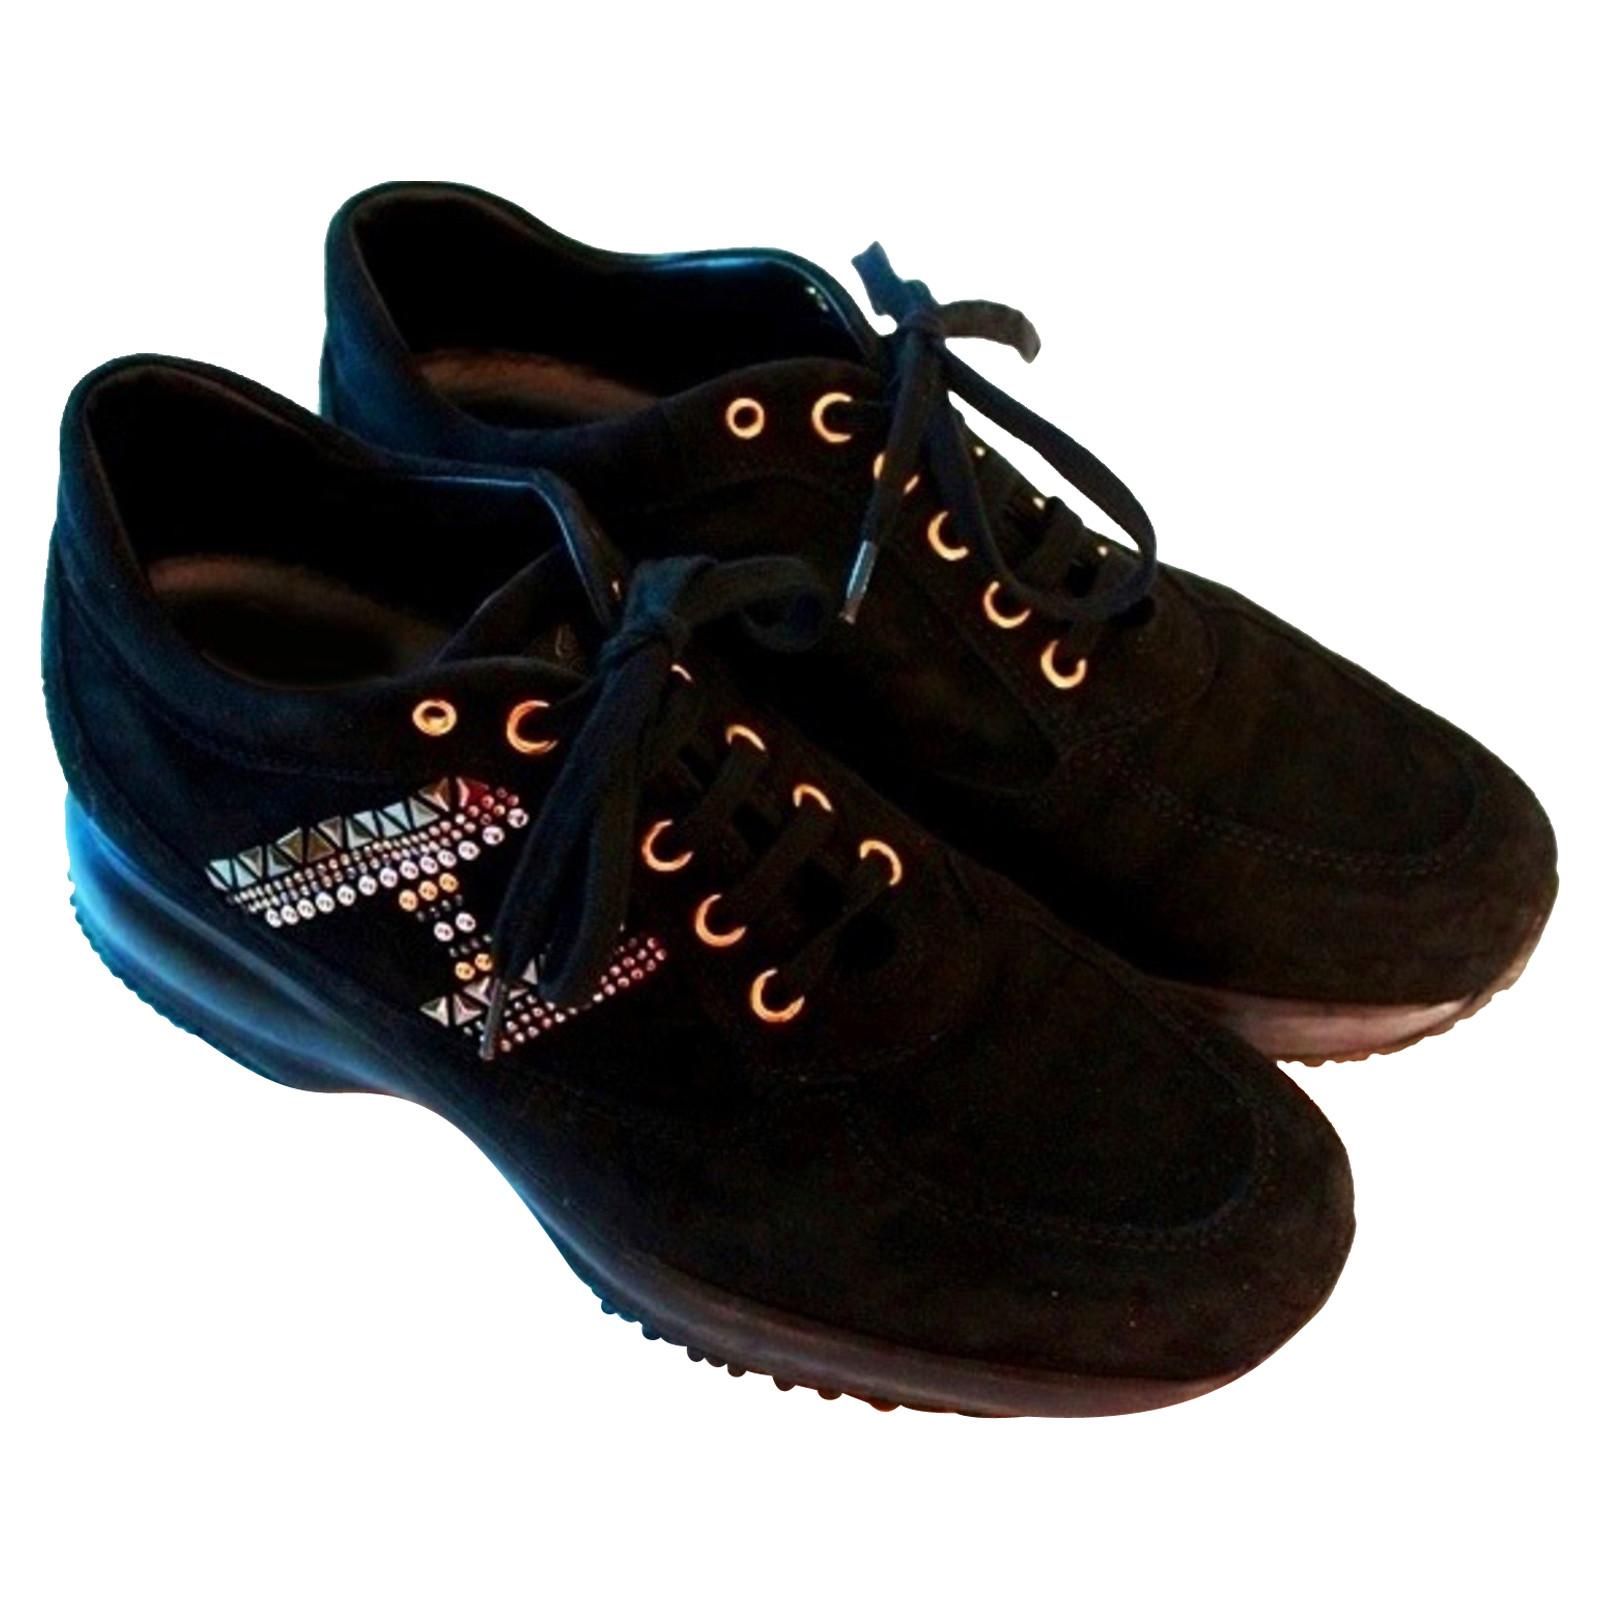 Hogan scarpe da ginnastica Plateau - Second hand Hogan scarpe da ...